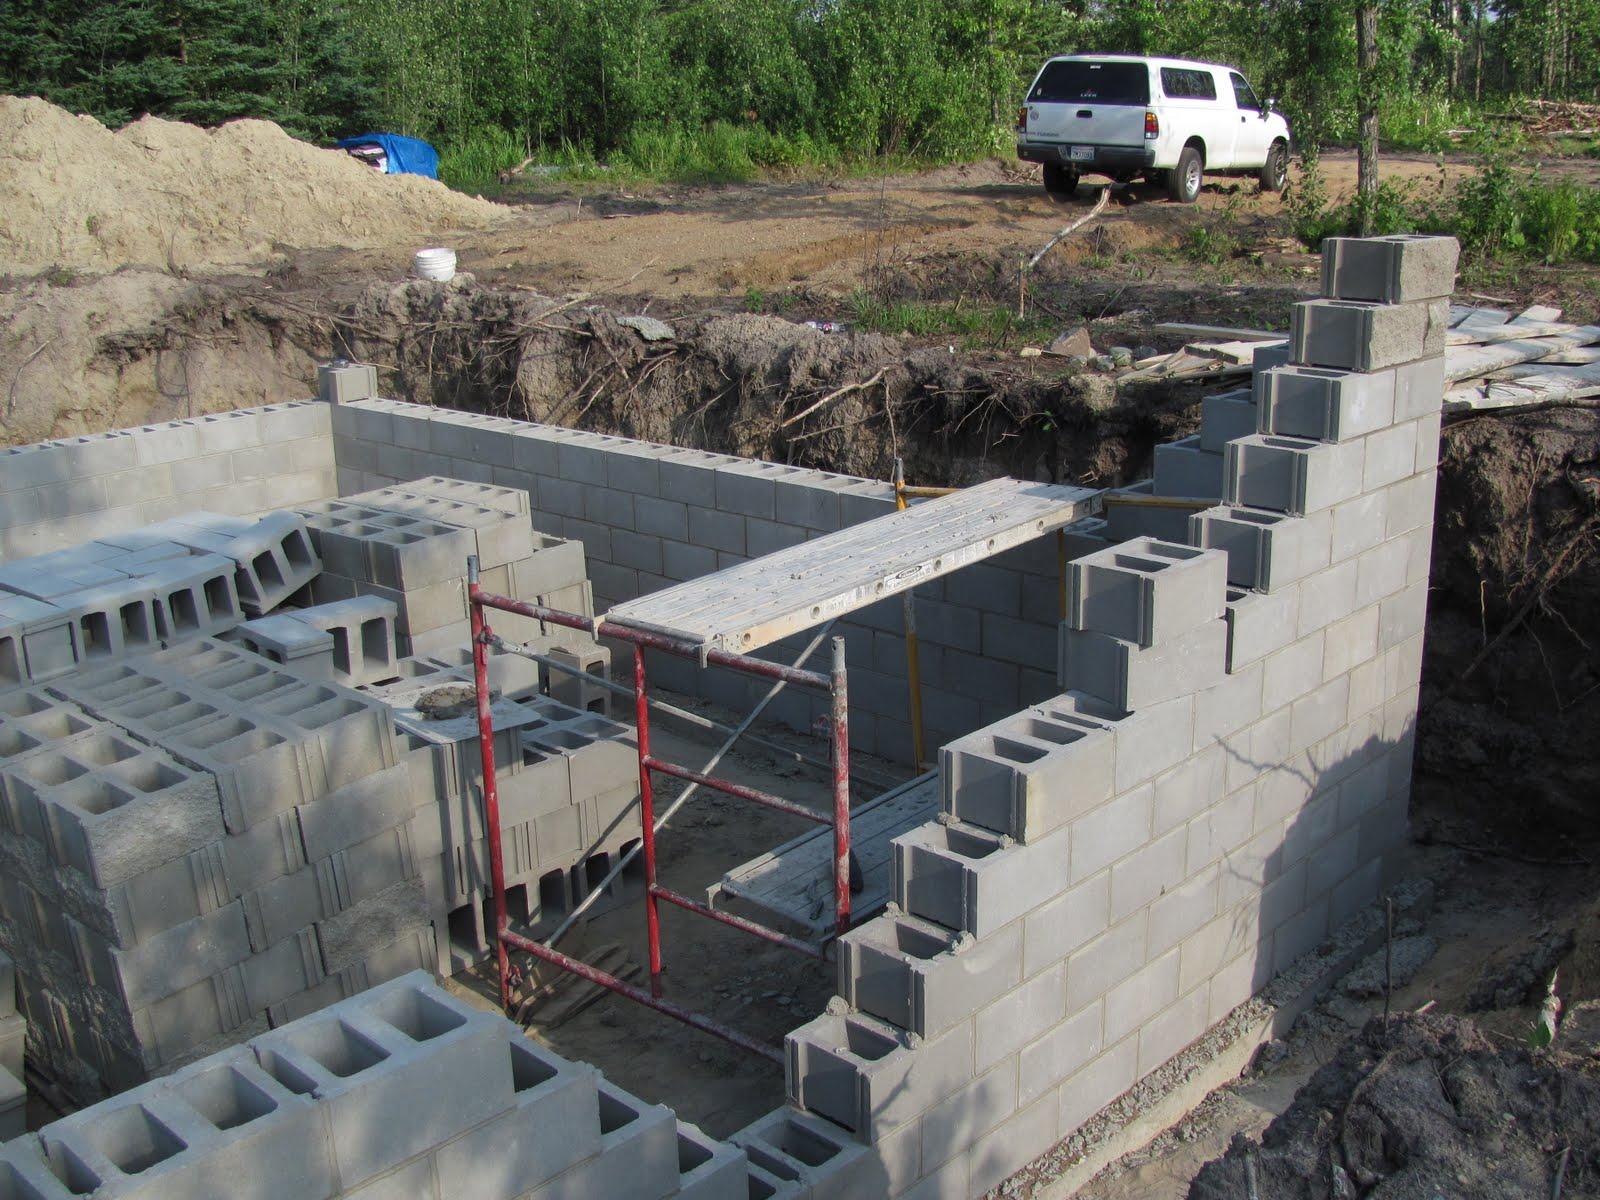 Basement Construction Day 1 | 1600 x 1200 · 320 kB · jpeg